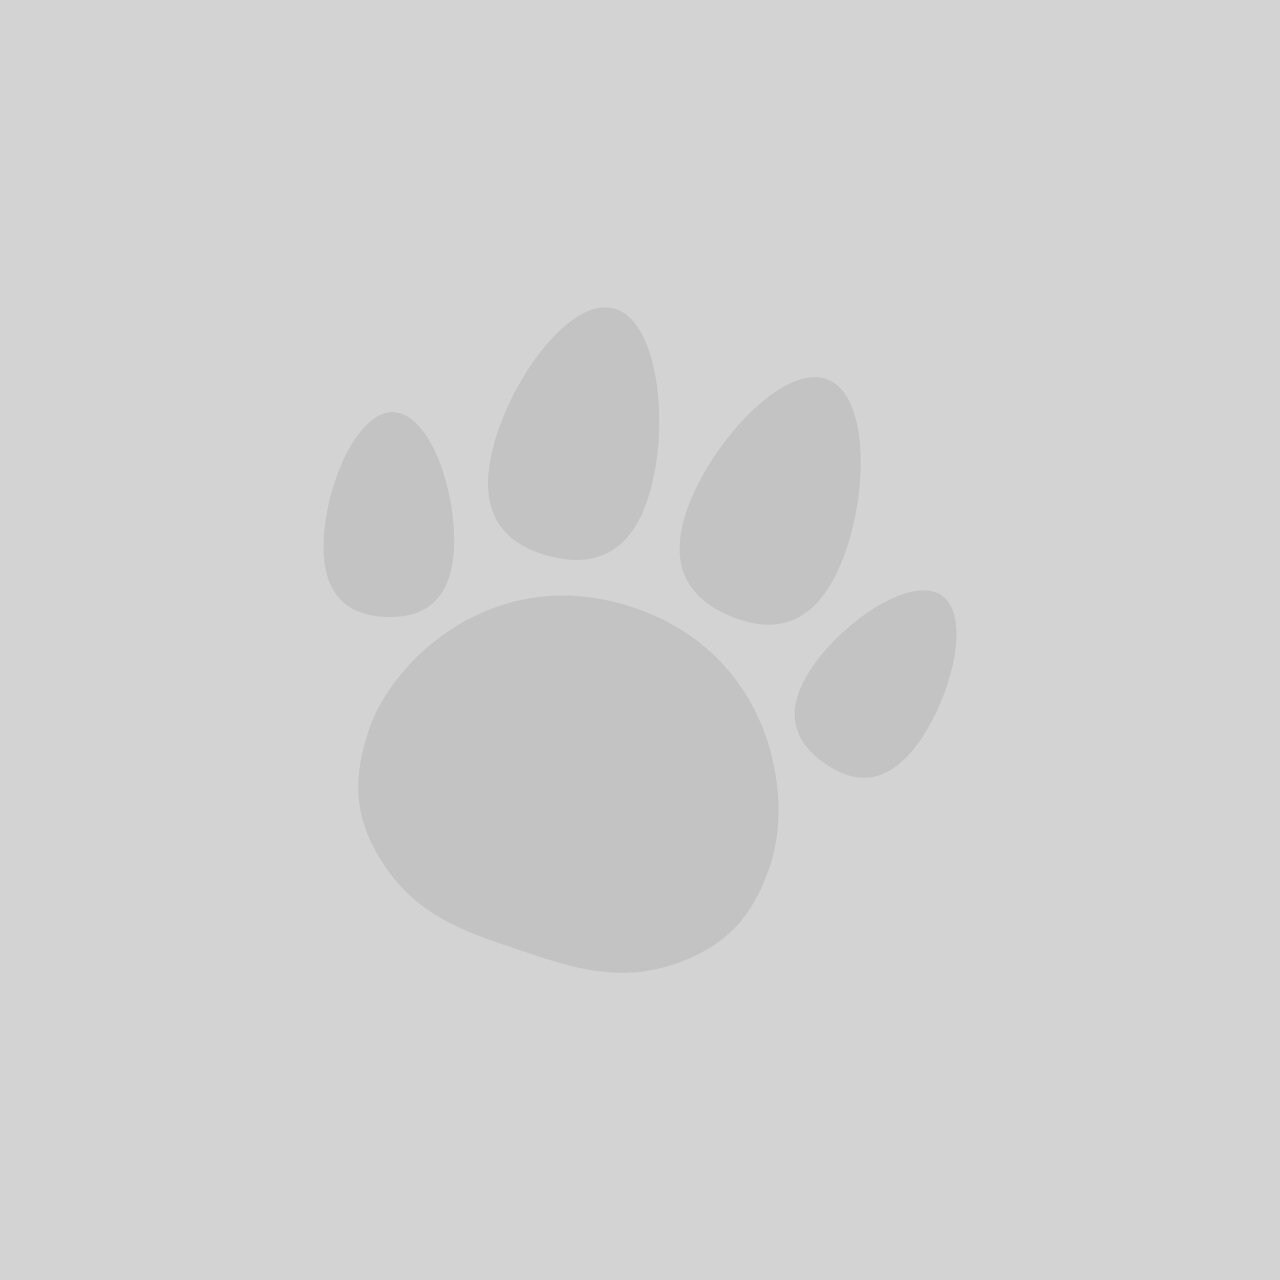 Beaphar Pet Behave Training Spray 125ml